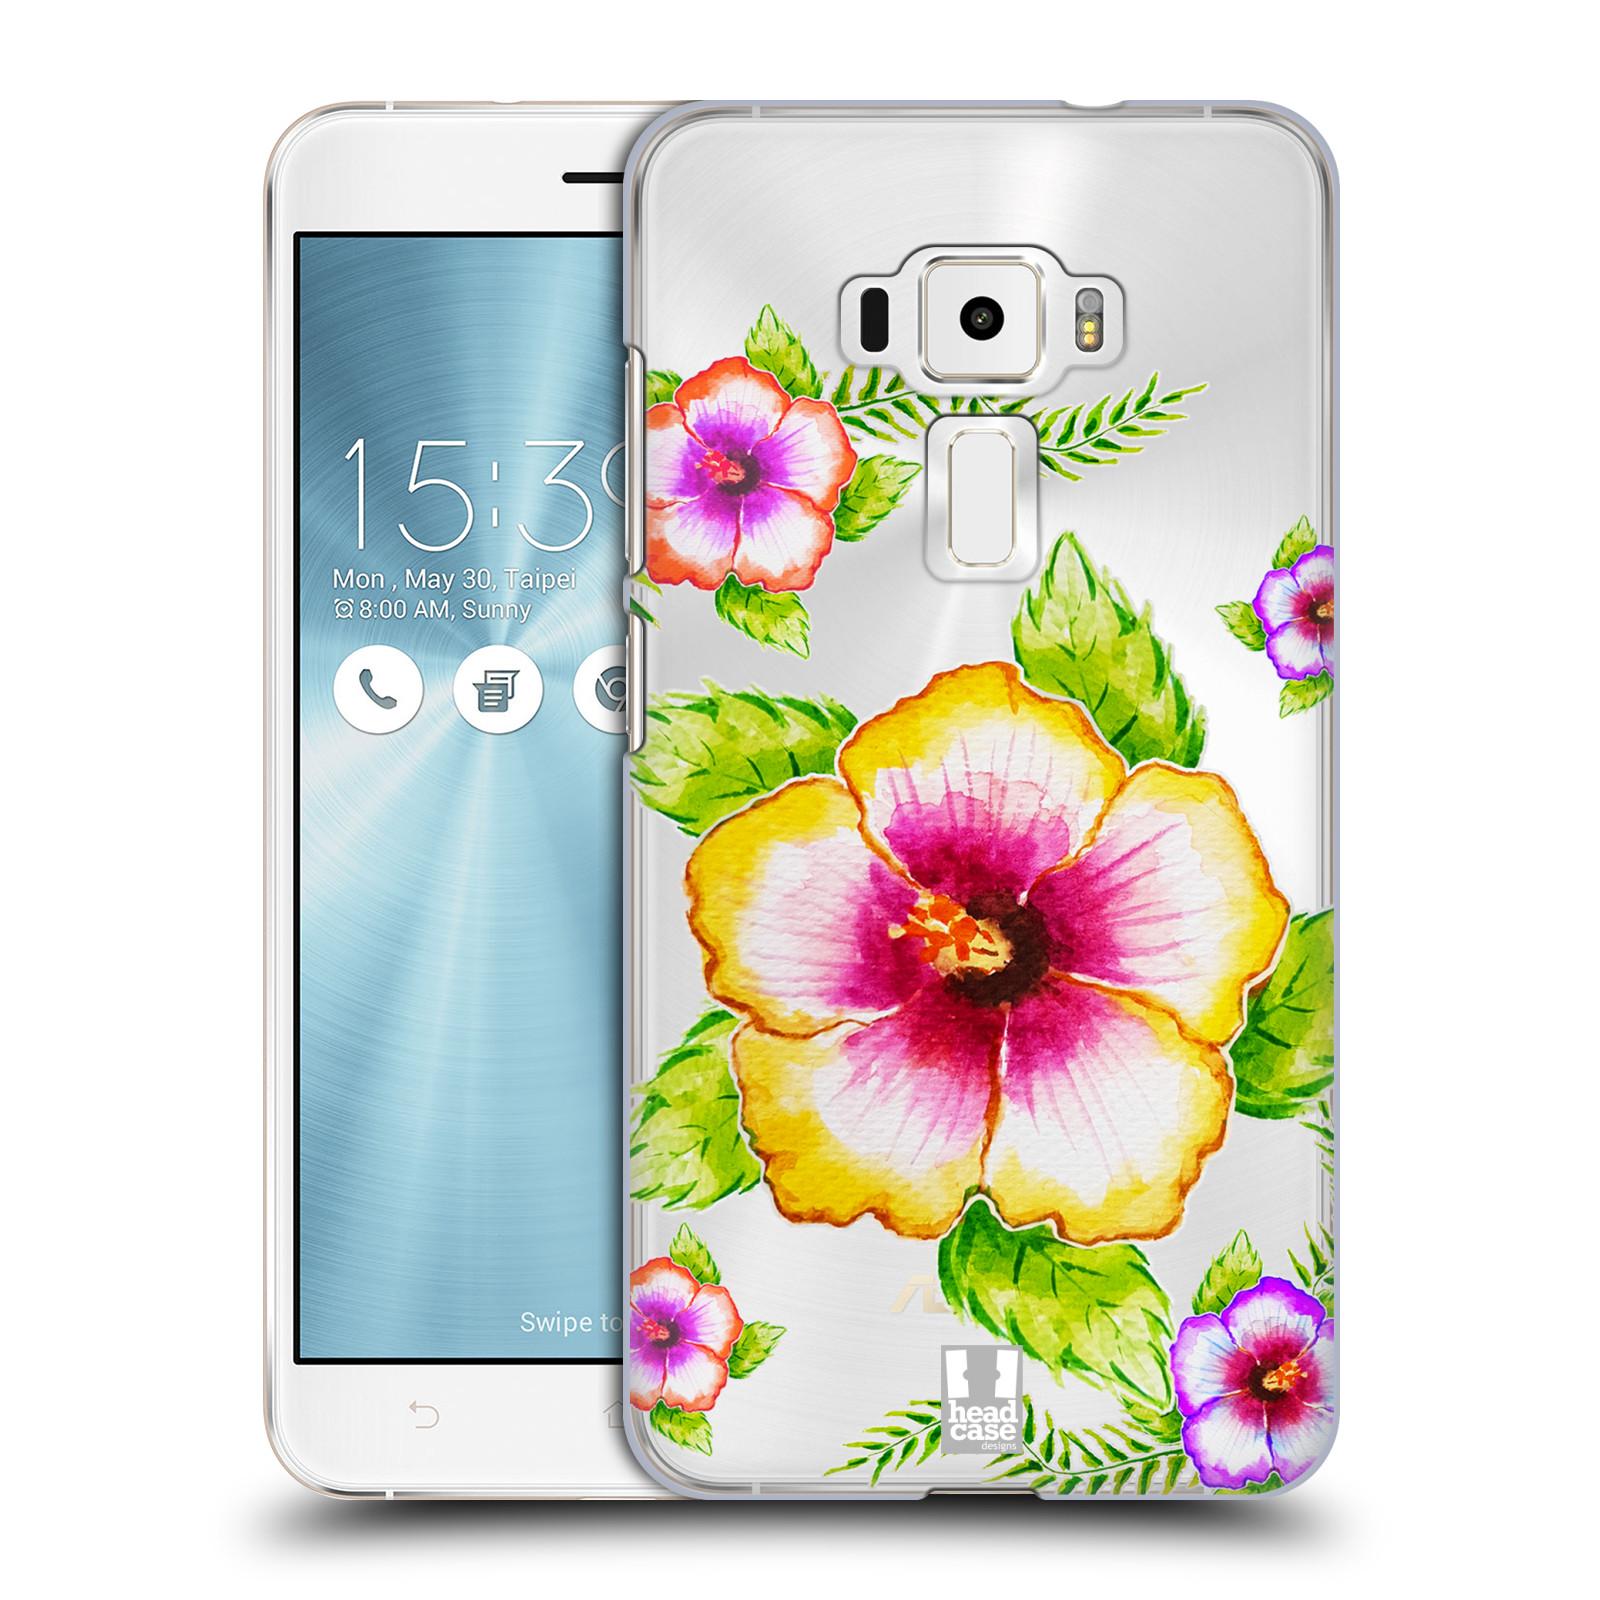 HEAD CASE plastový obal na mobil Asus Zenfone 3 ZE552KL Květina Ibišek vodní barvy